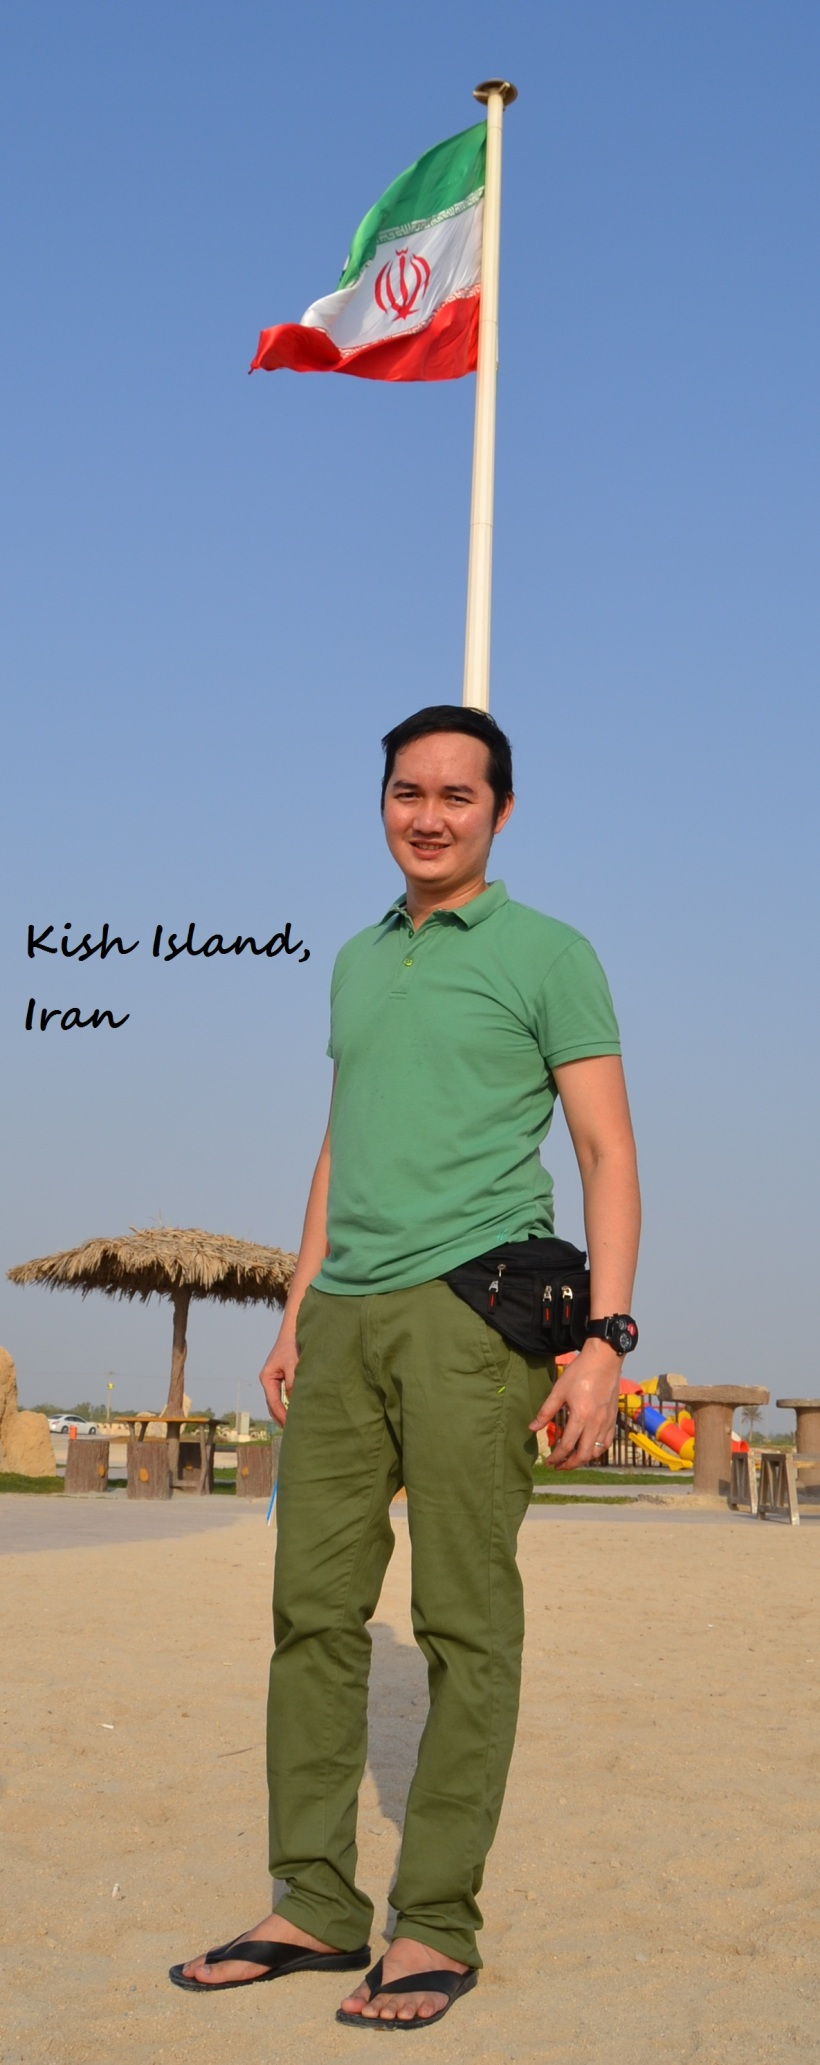 @Kish Island, Iran